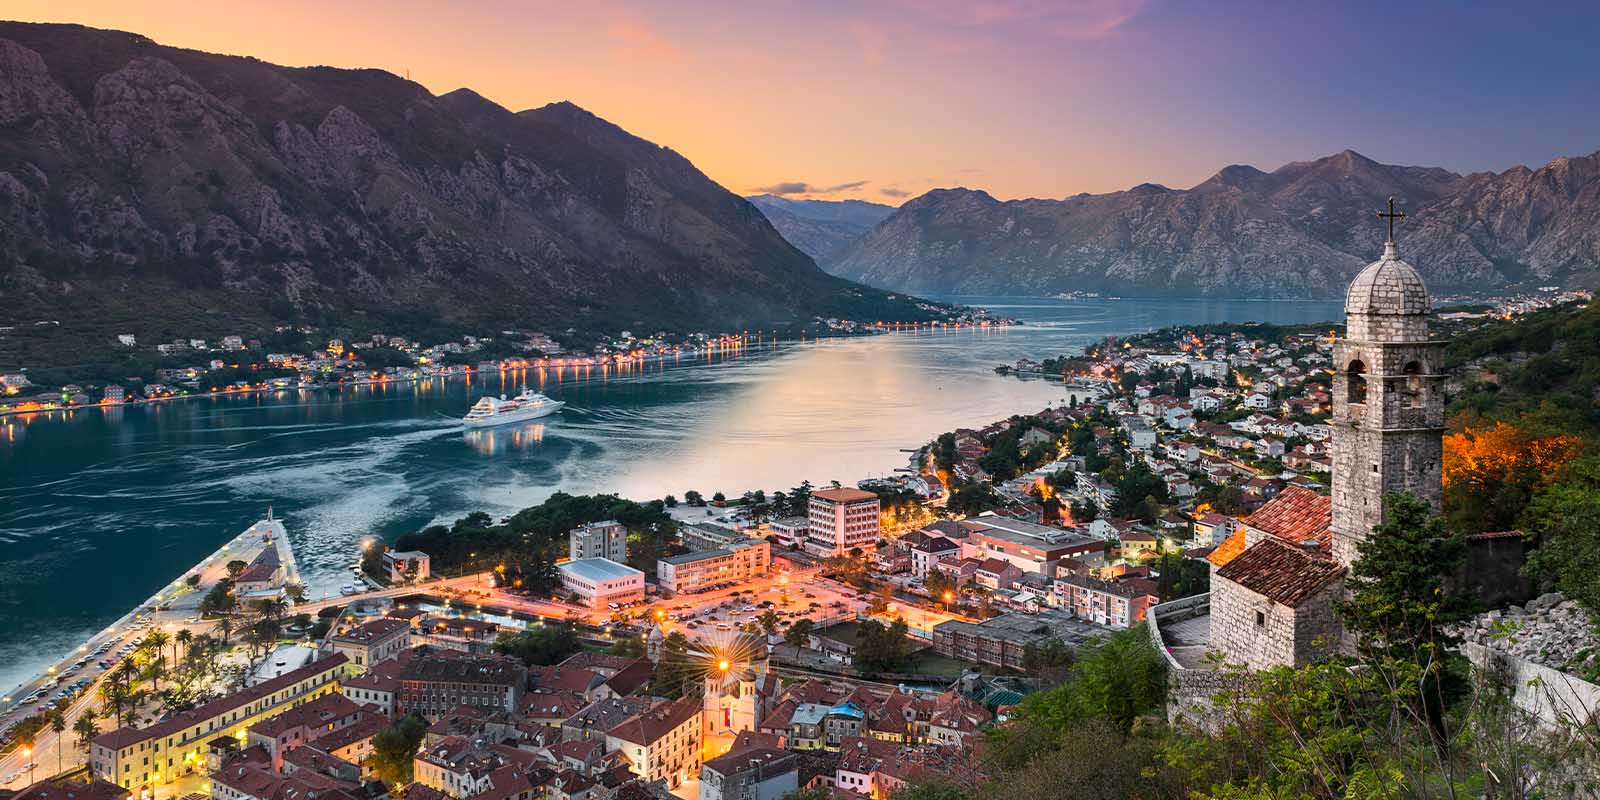 Aerial view of Montenegro